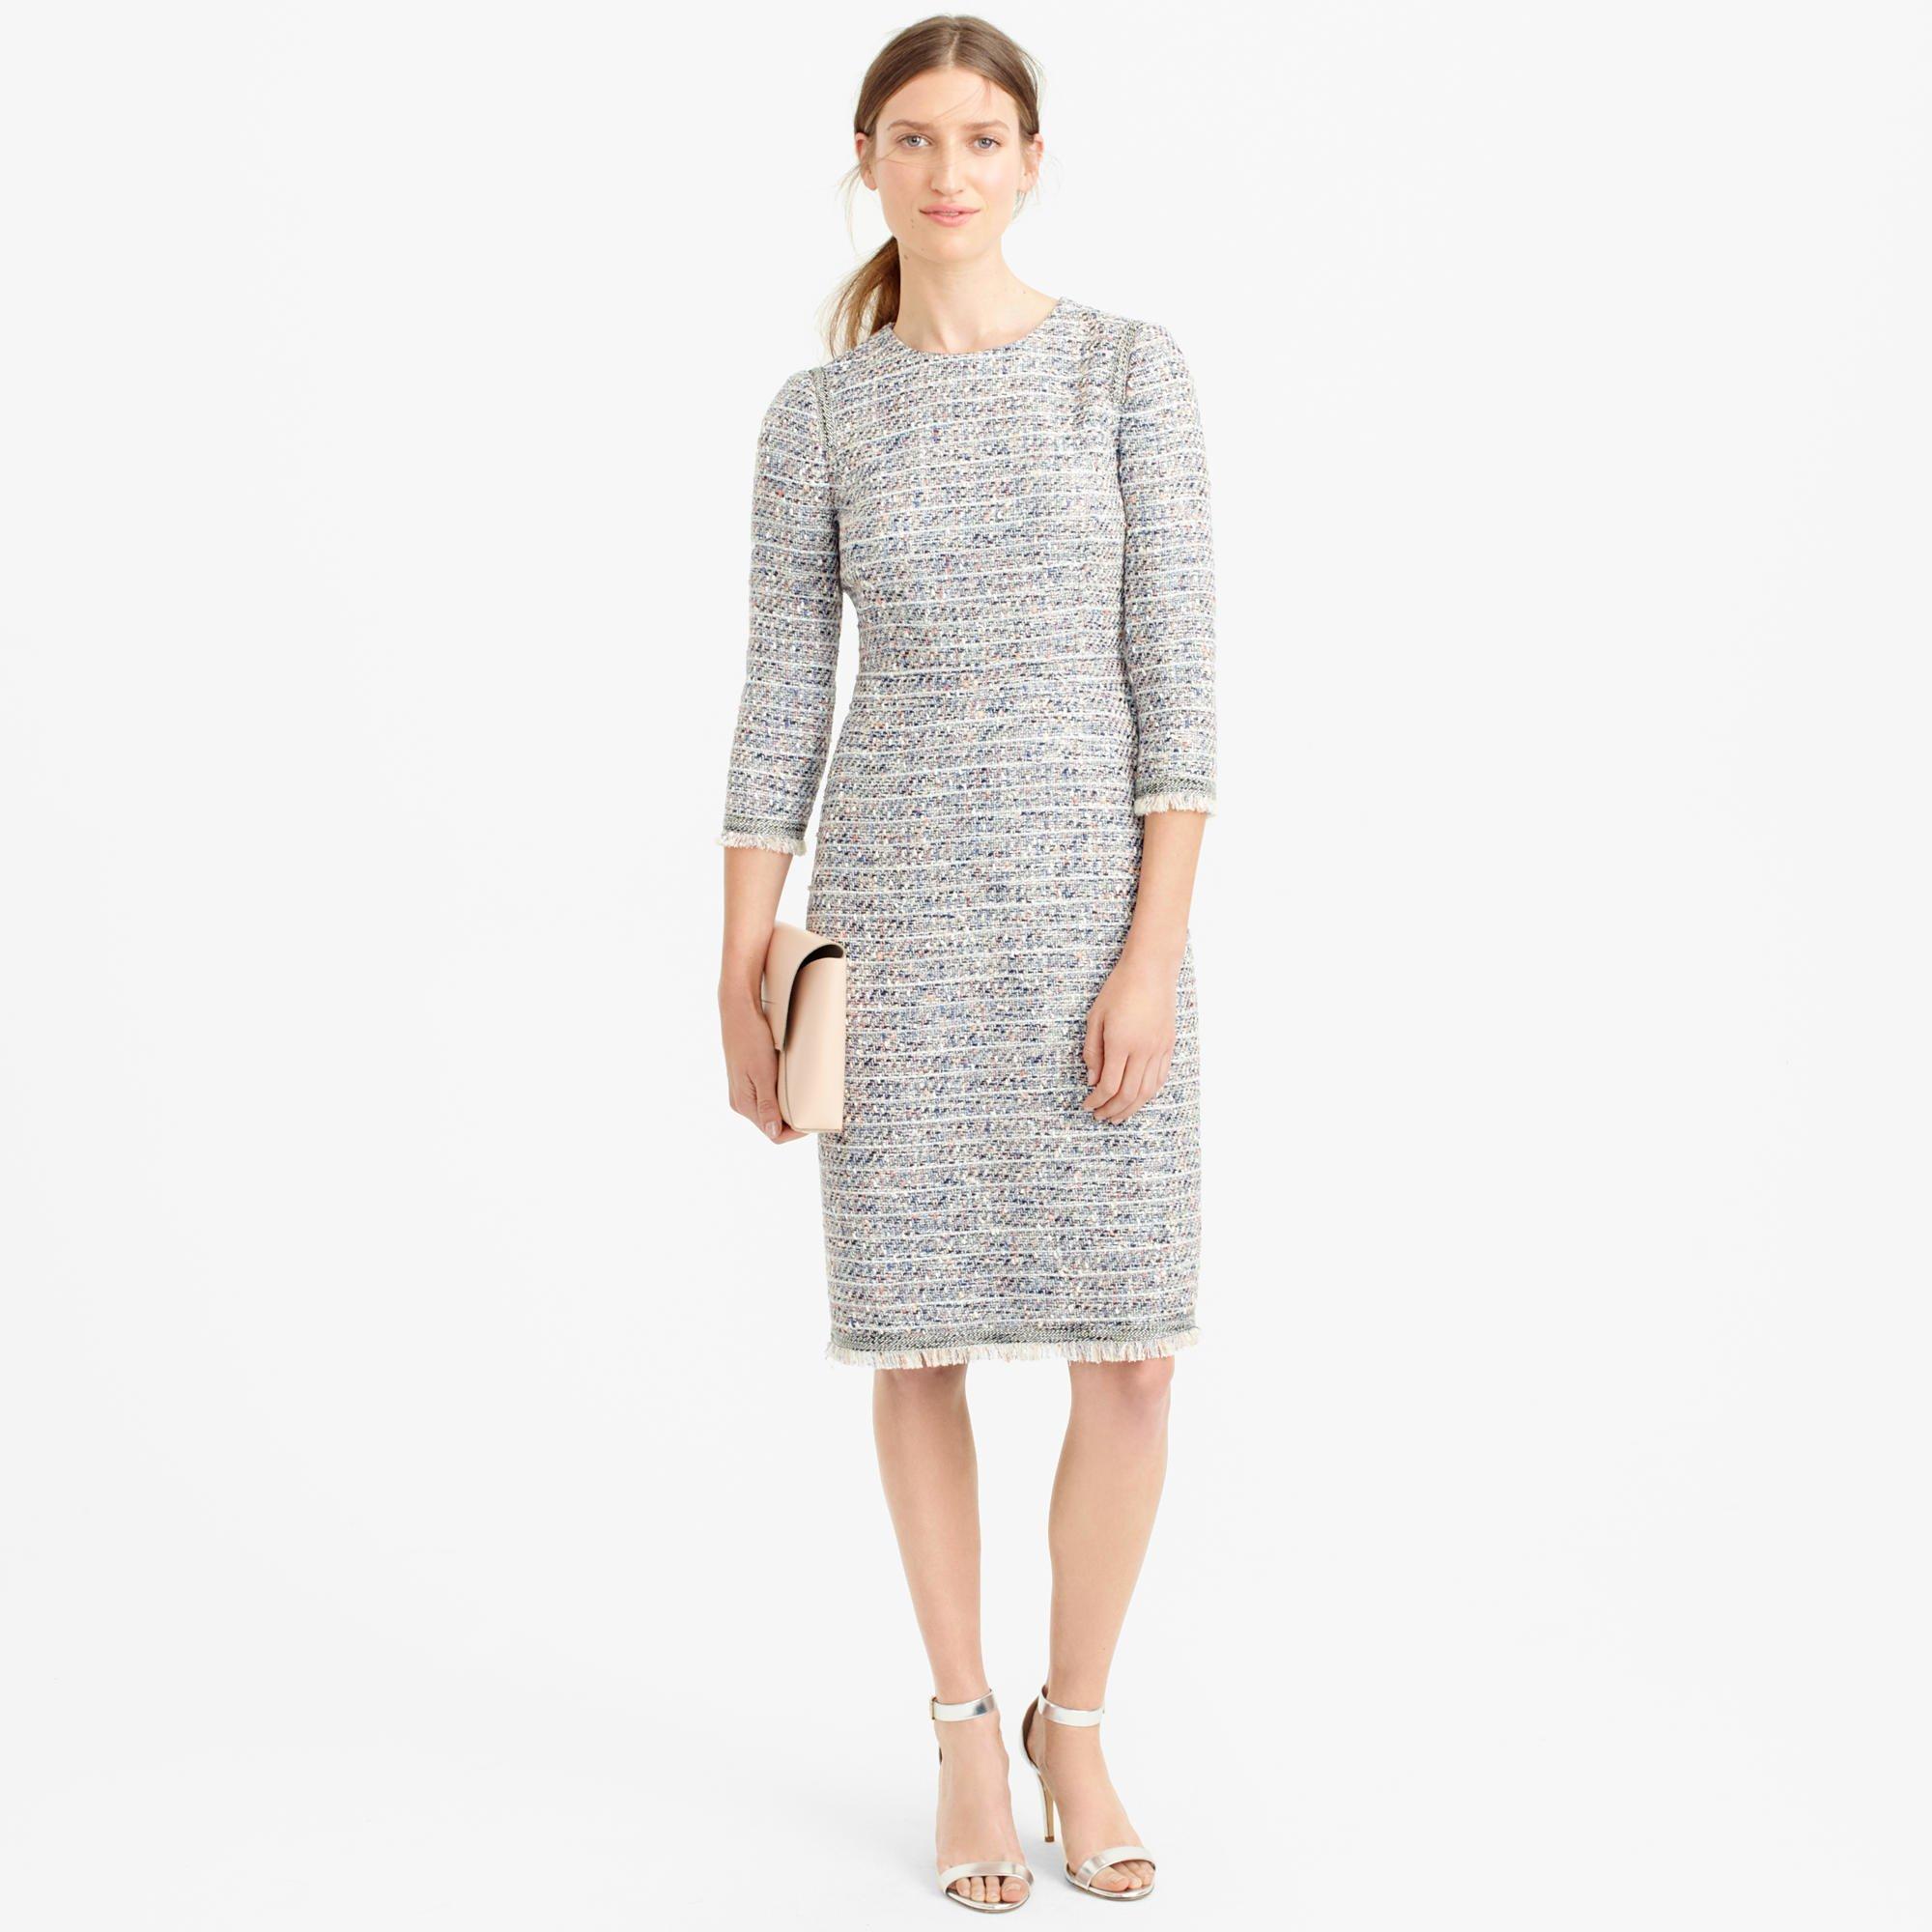 Long Sleeve Multicolored Tweed Dress With Fringe